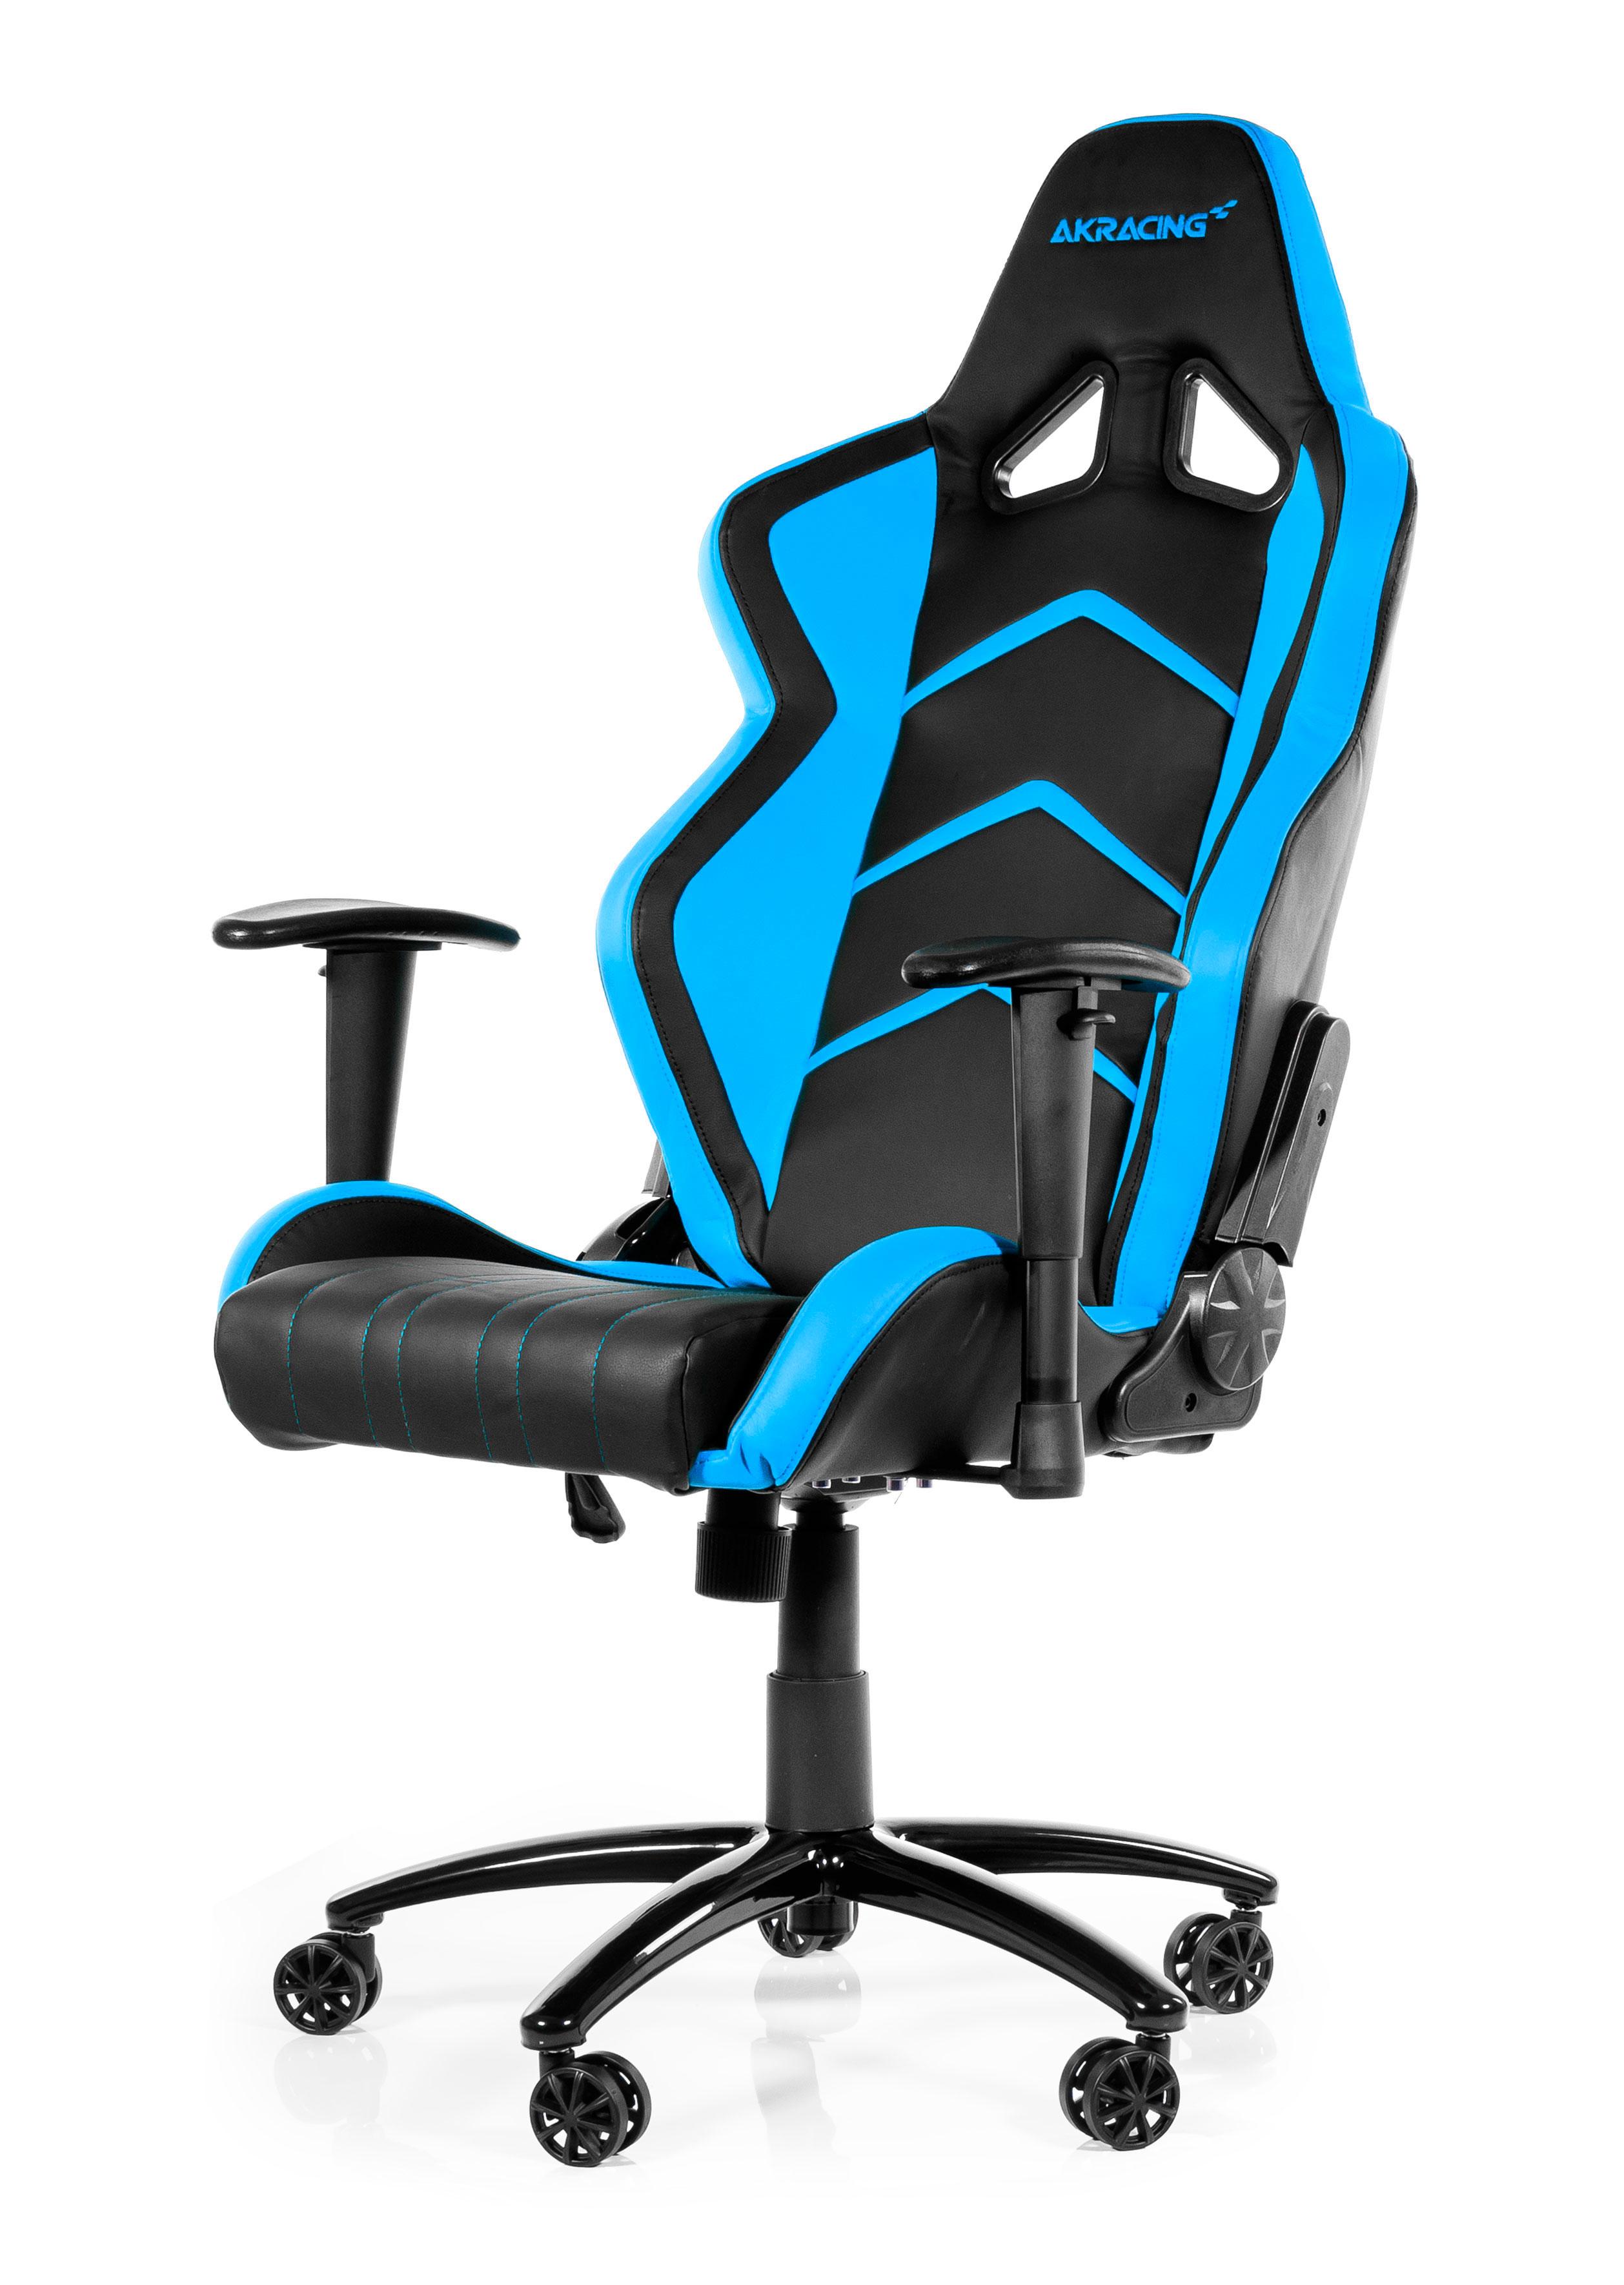 Image of AKRacing AK-K6014-BL Videospiel-Stuhl PC-Spielstuhl Gepolsterter Sitz